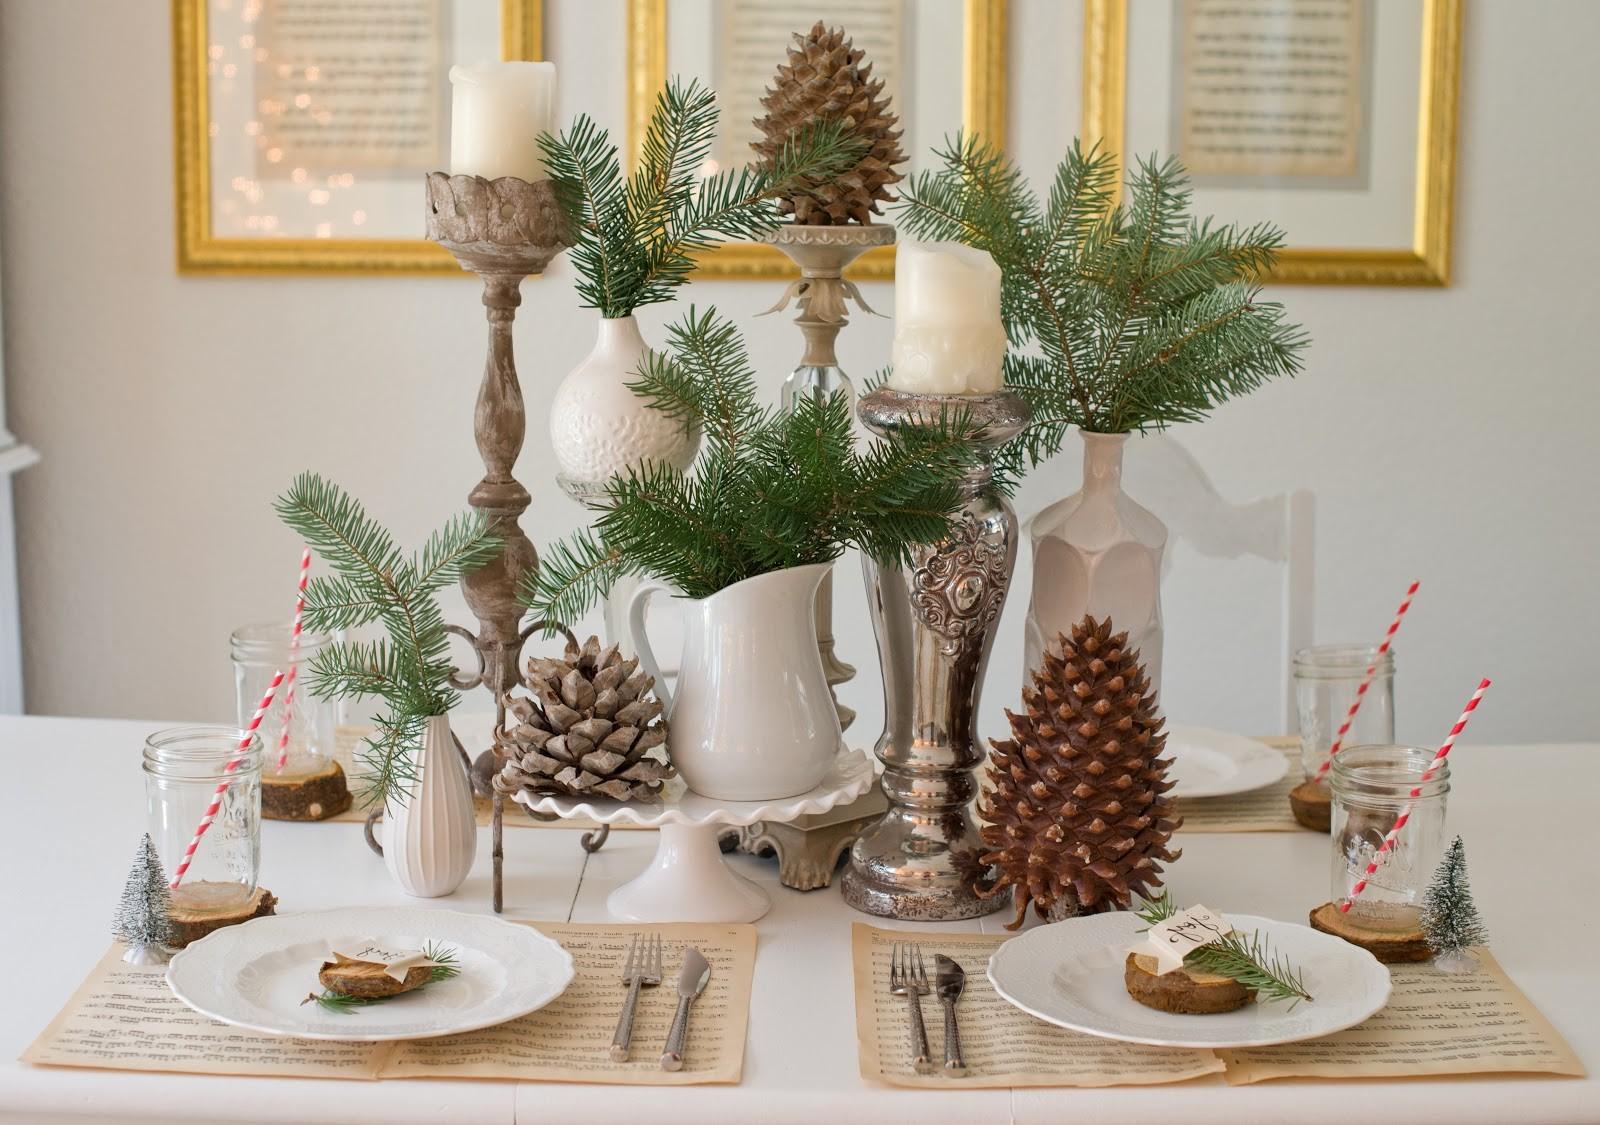 Table de Noël festive.